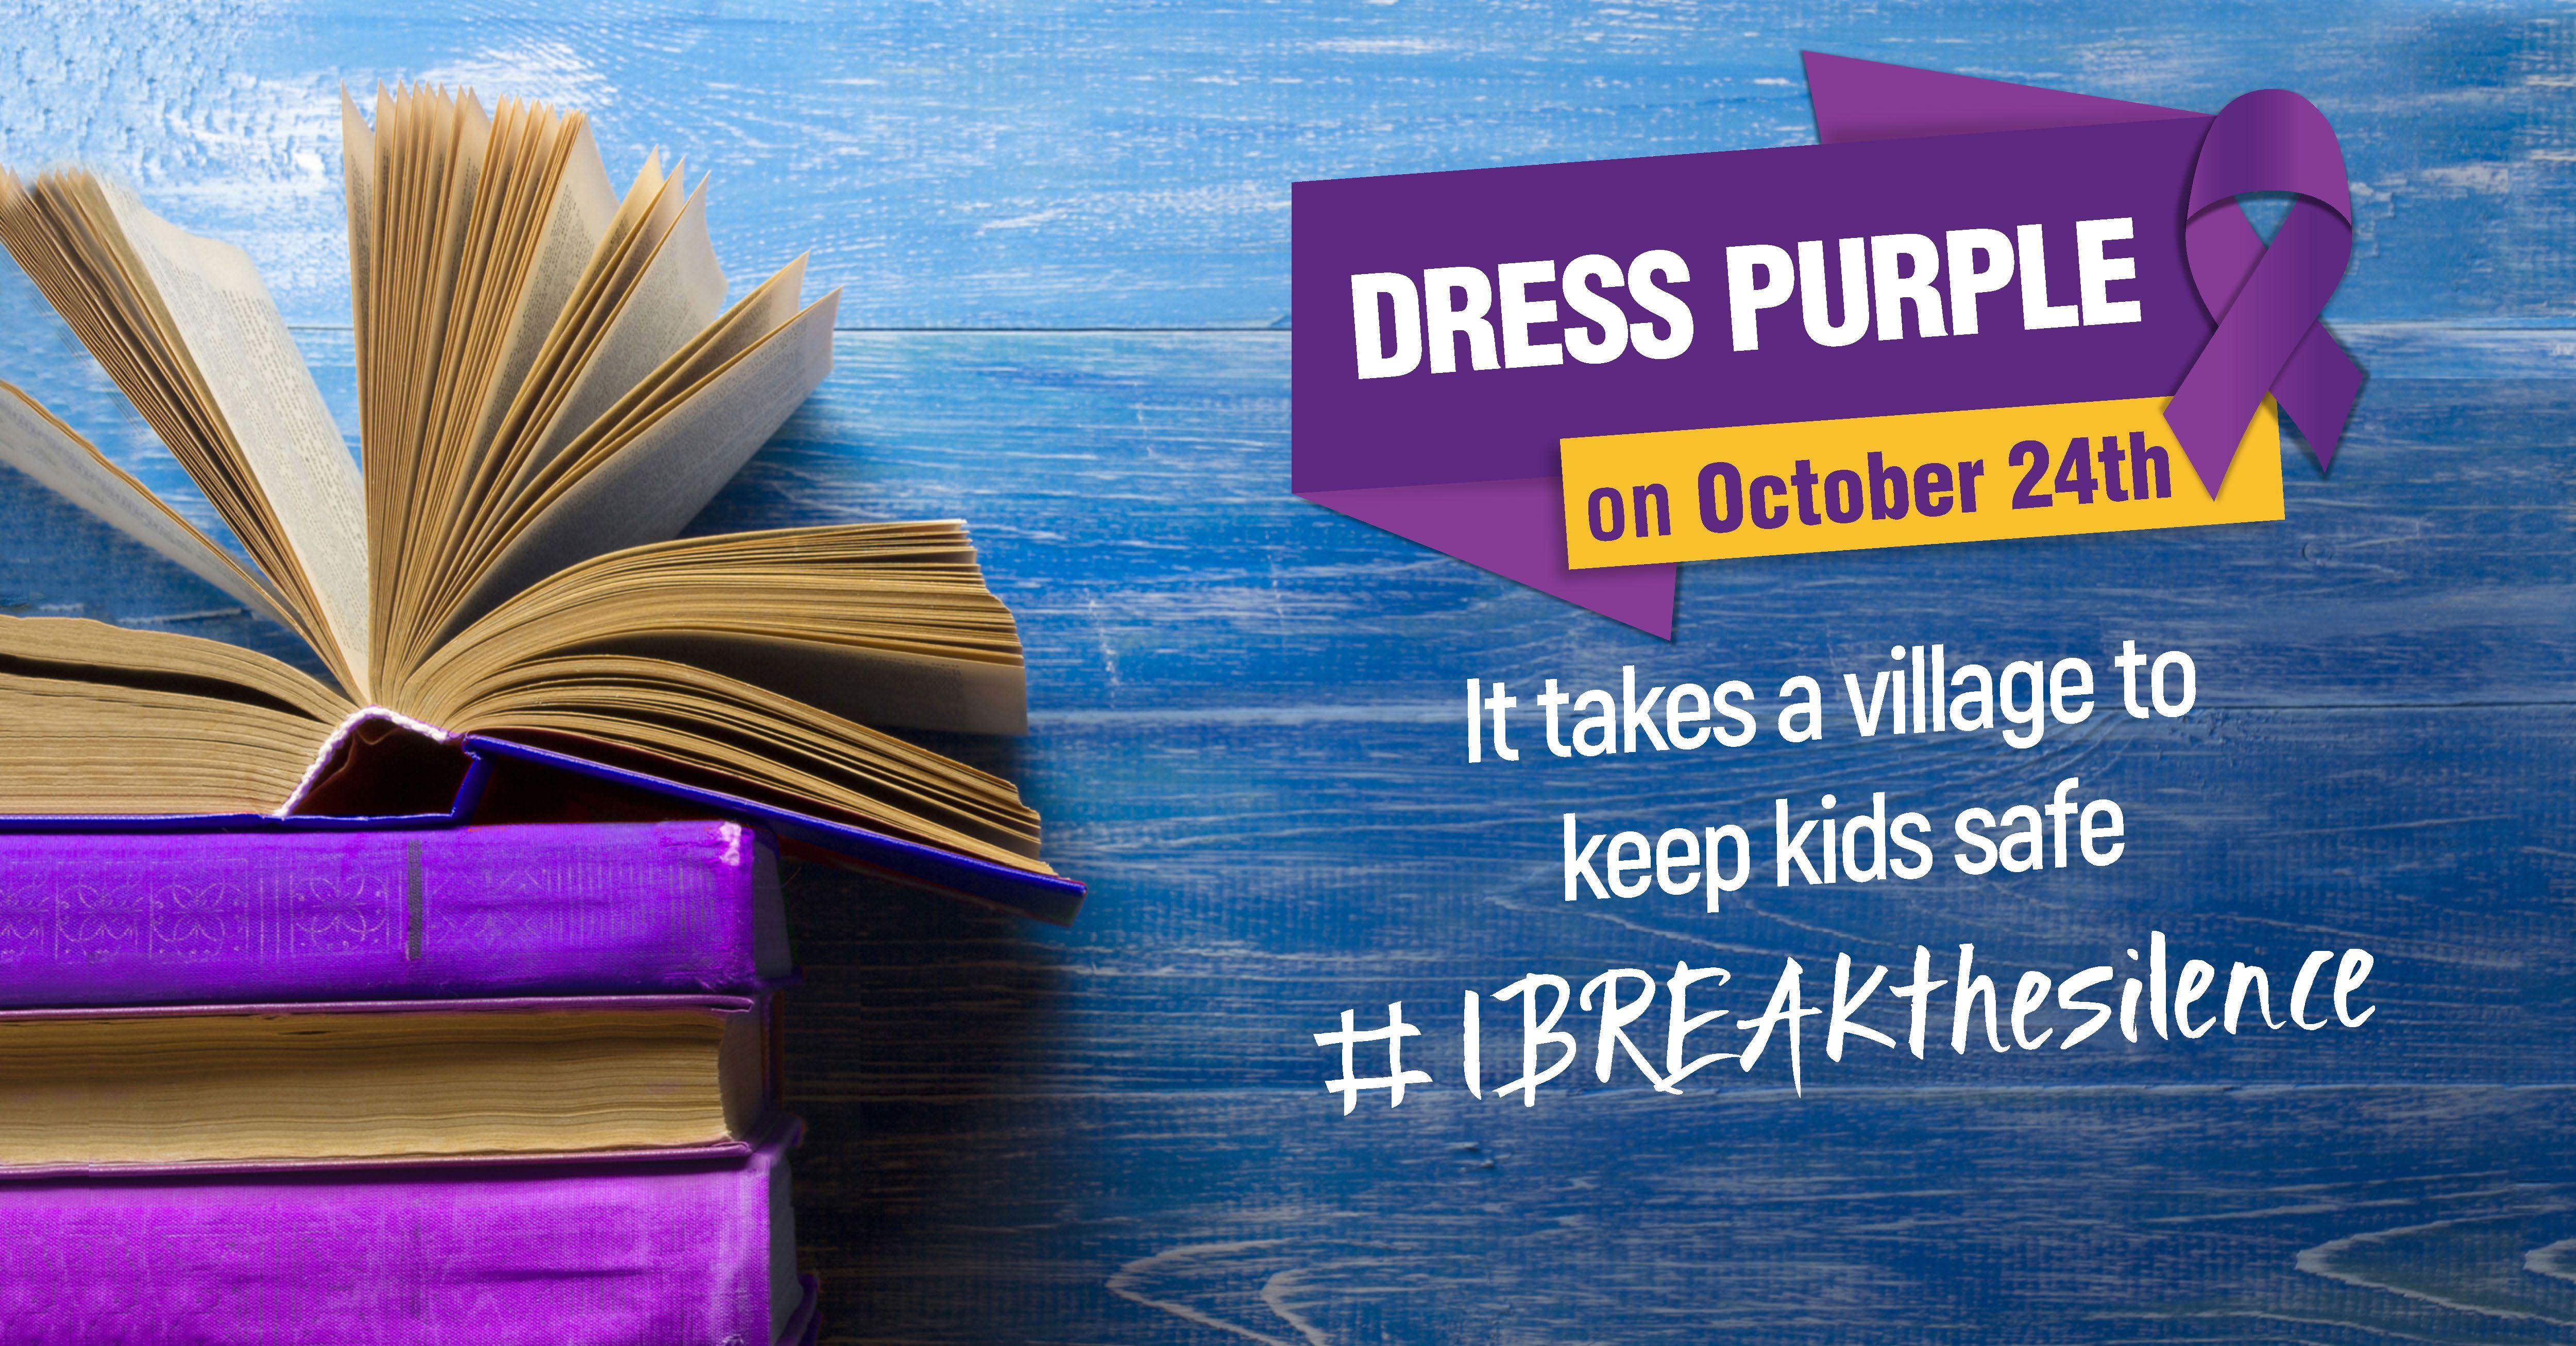 Dress Purple Day Campaign | TEACHER RESOURCES | Pinterest | Child ...